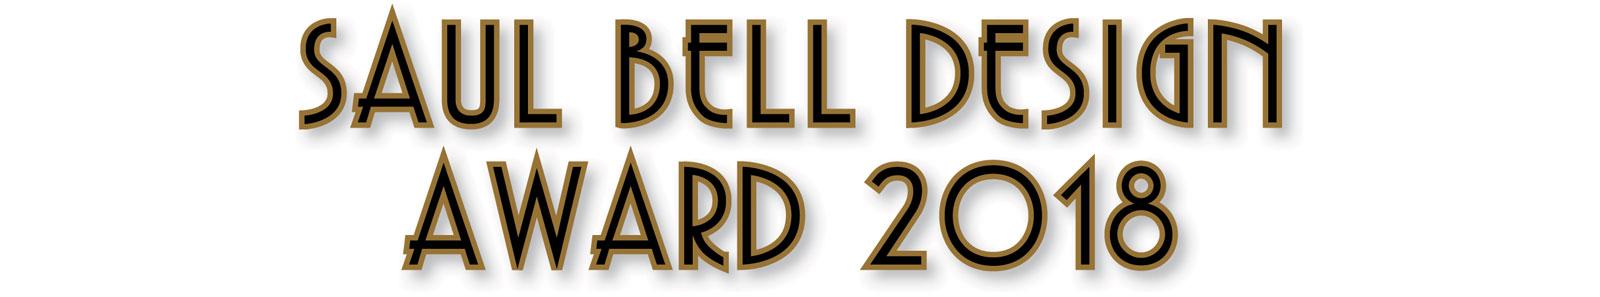 40_5_Saul-Bell-Design-Award-Title.jpg